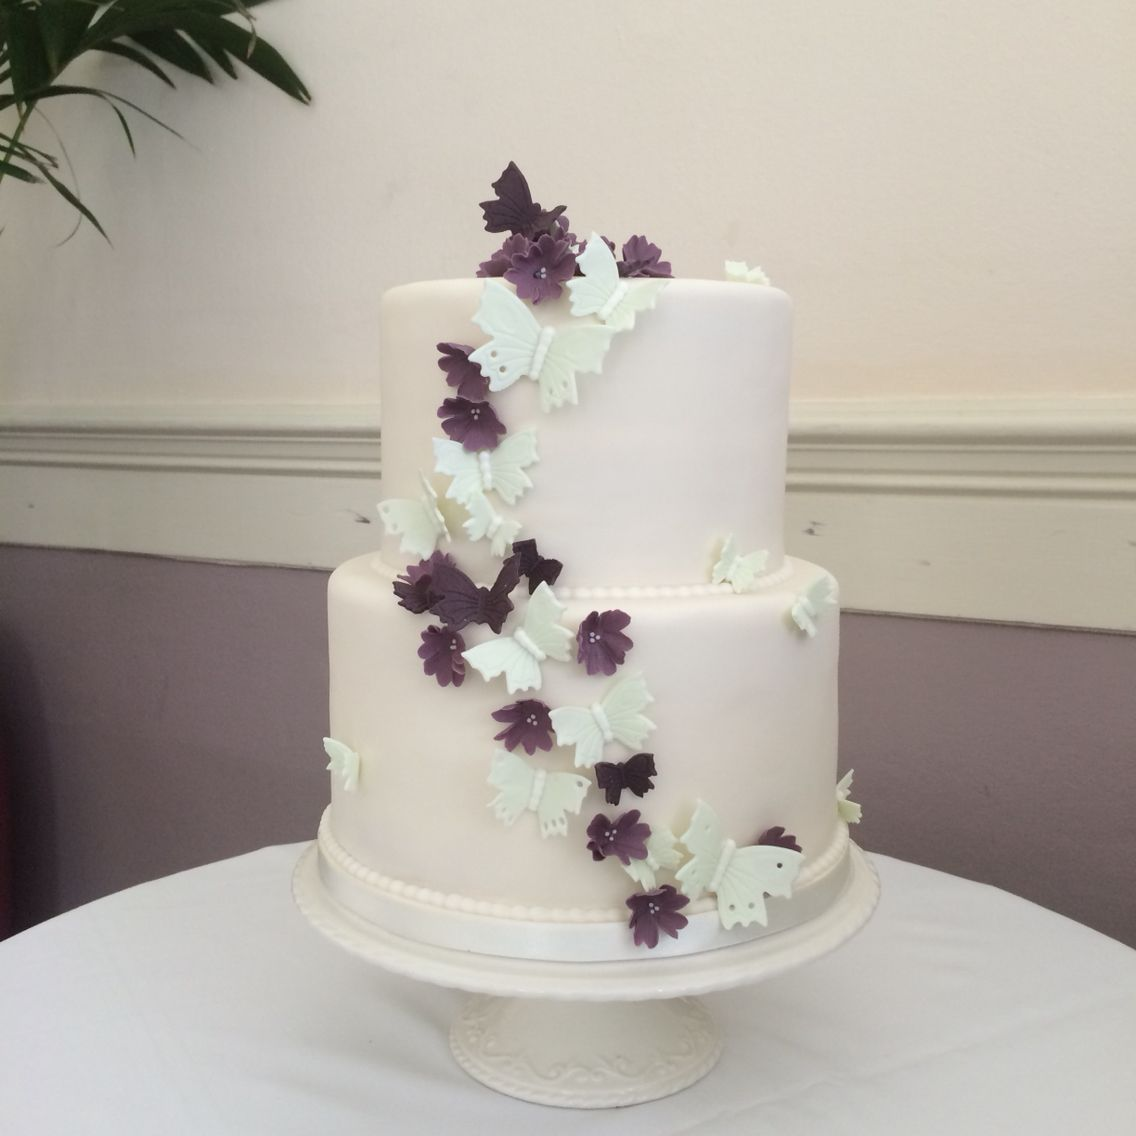 Mint and purple butterfly wedding cake | Kawaii Cakes | Pinterest ...